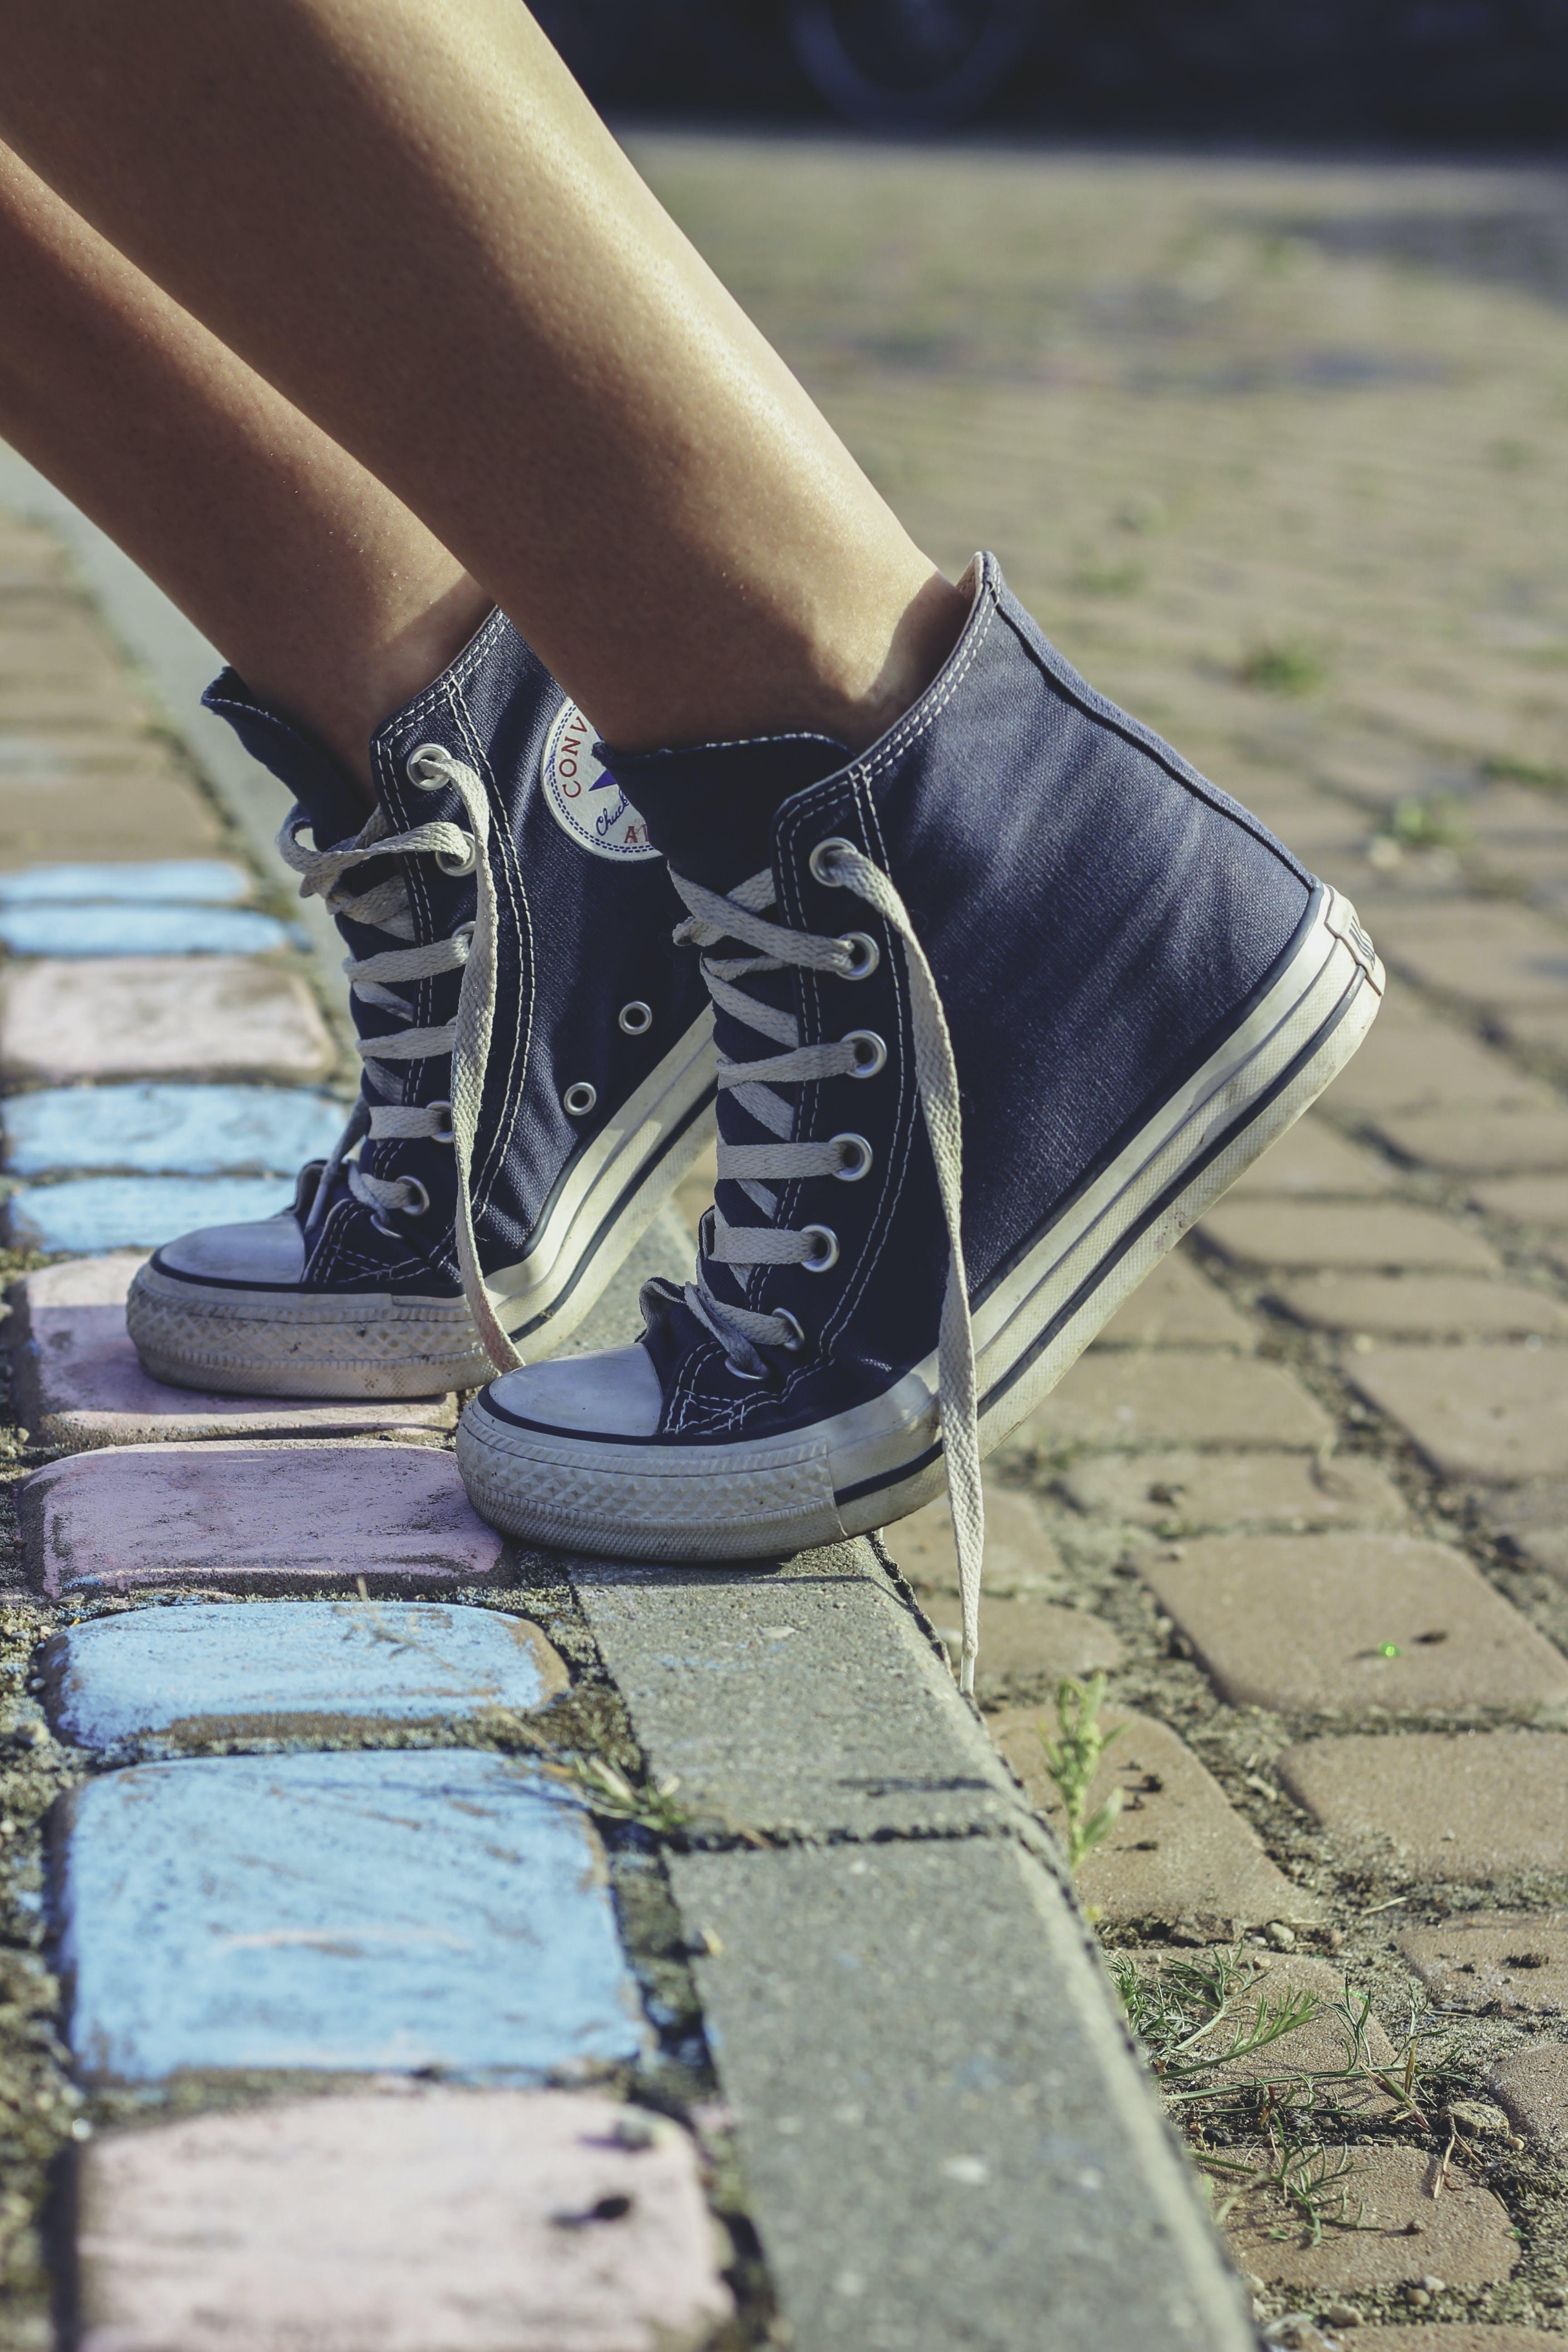 Kostenloses Stock Foto zu gegenteilig, schuhe, sneakers